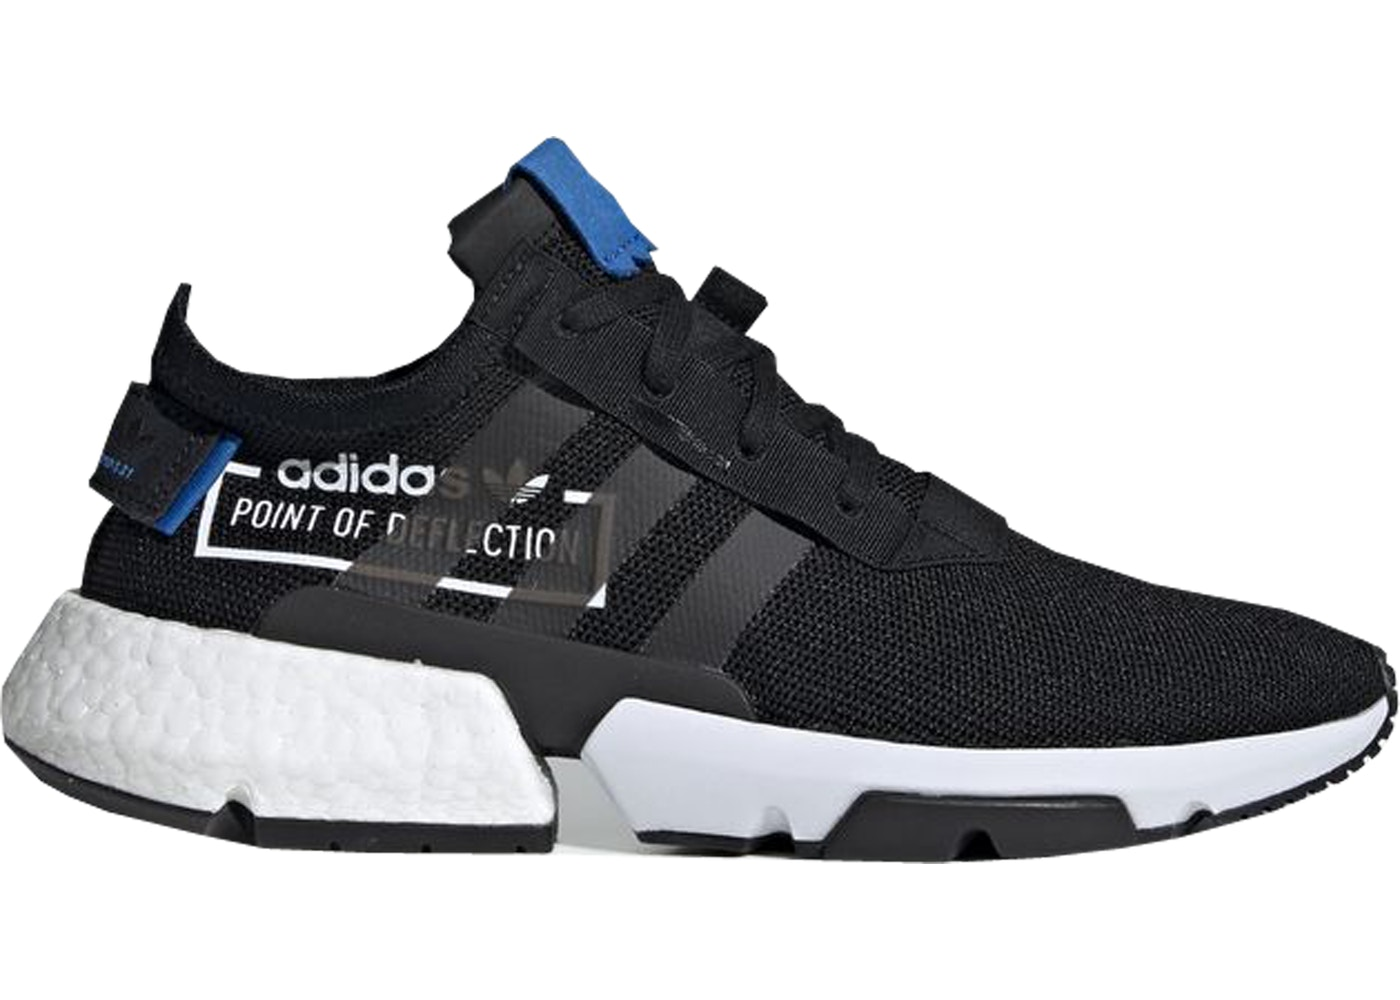 adidas pod s3 1 alphatype